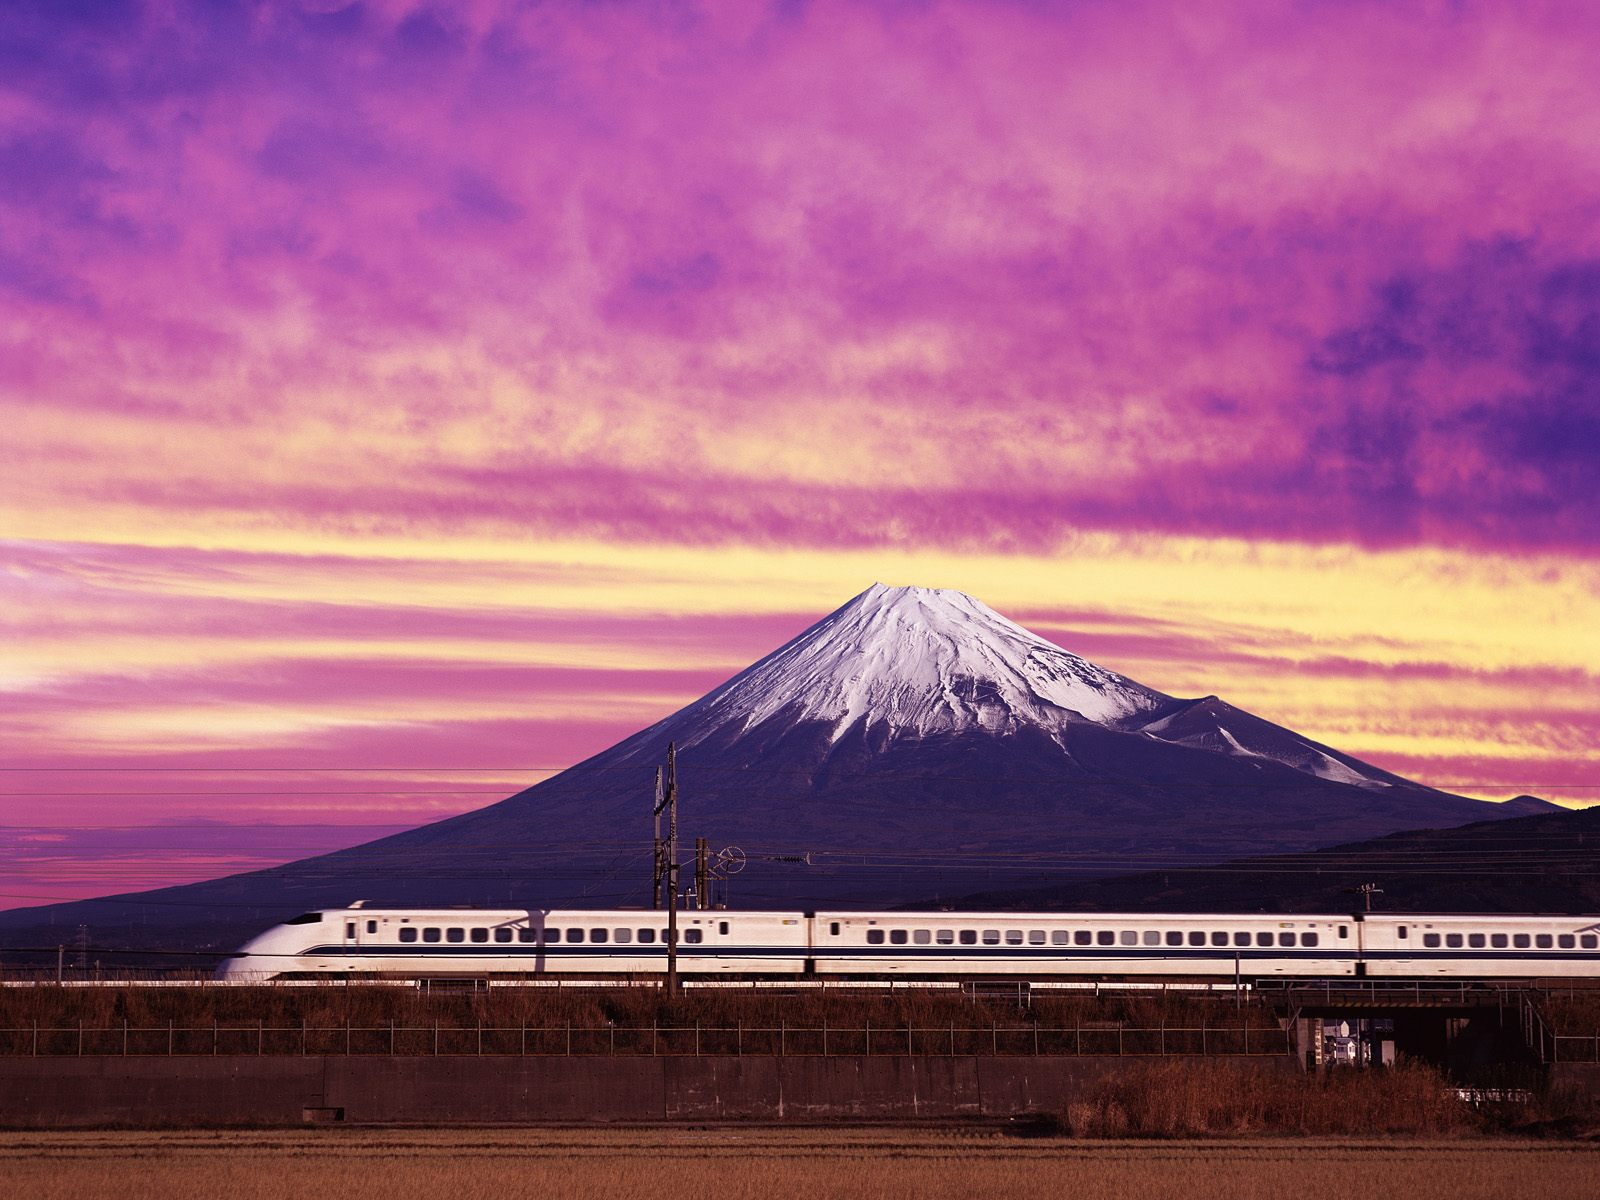 https://www.citypictures.org/data/media/230/Shinkansen_Bullet_Train_and_Mount_Fuji_Japan.jpg